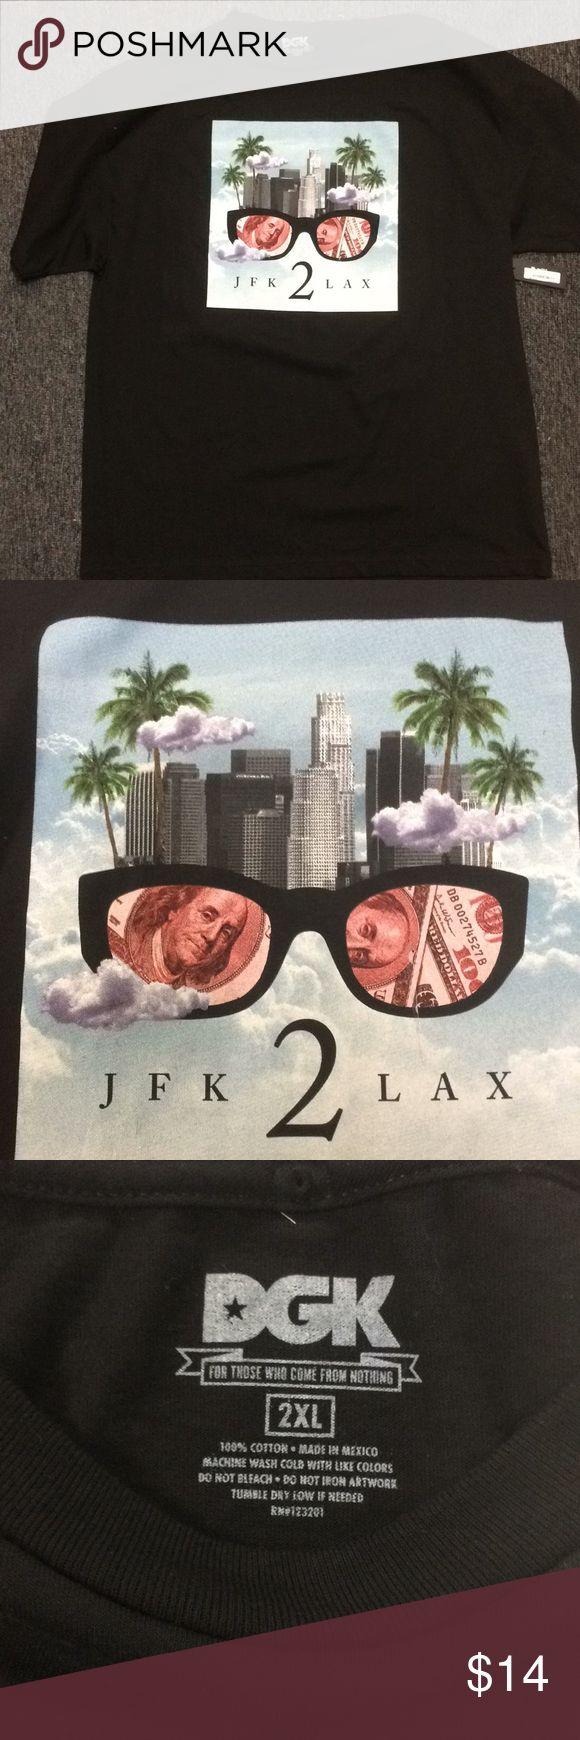 New DGK Black tee DGK JFK 2 LAX XXL Tee. New with tag DGK Shirts Tees - Short Sleeve